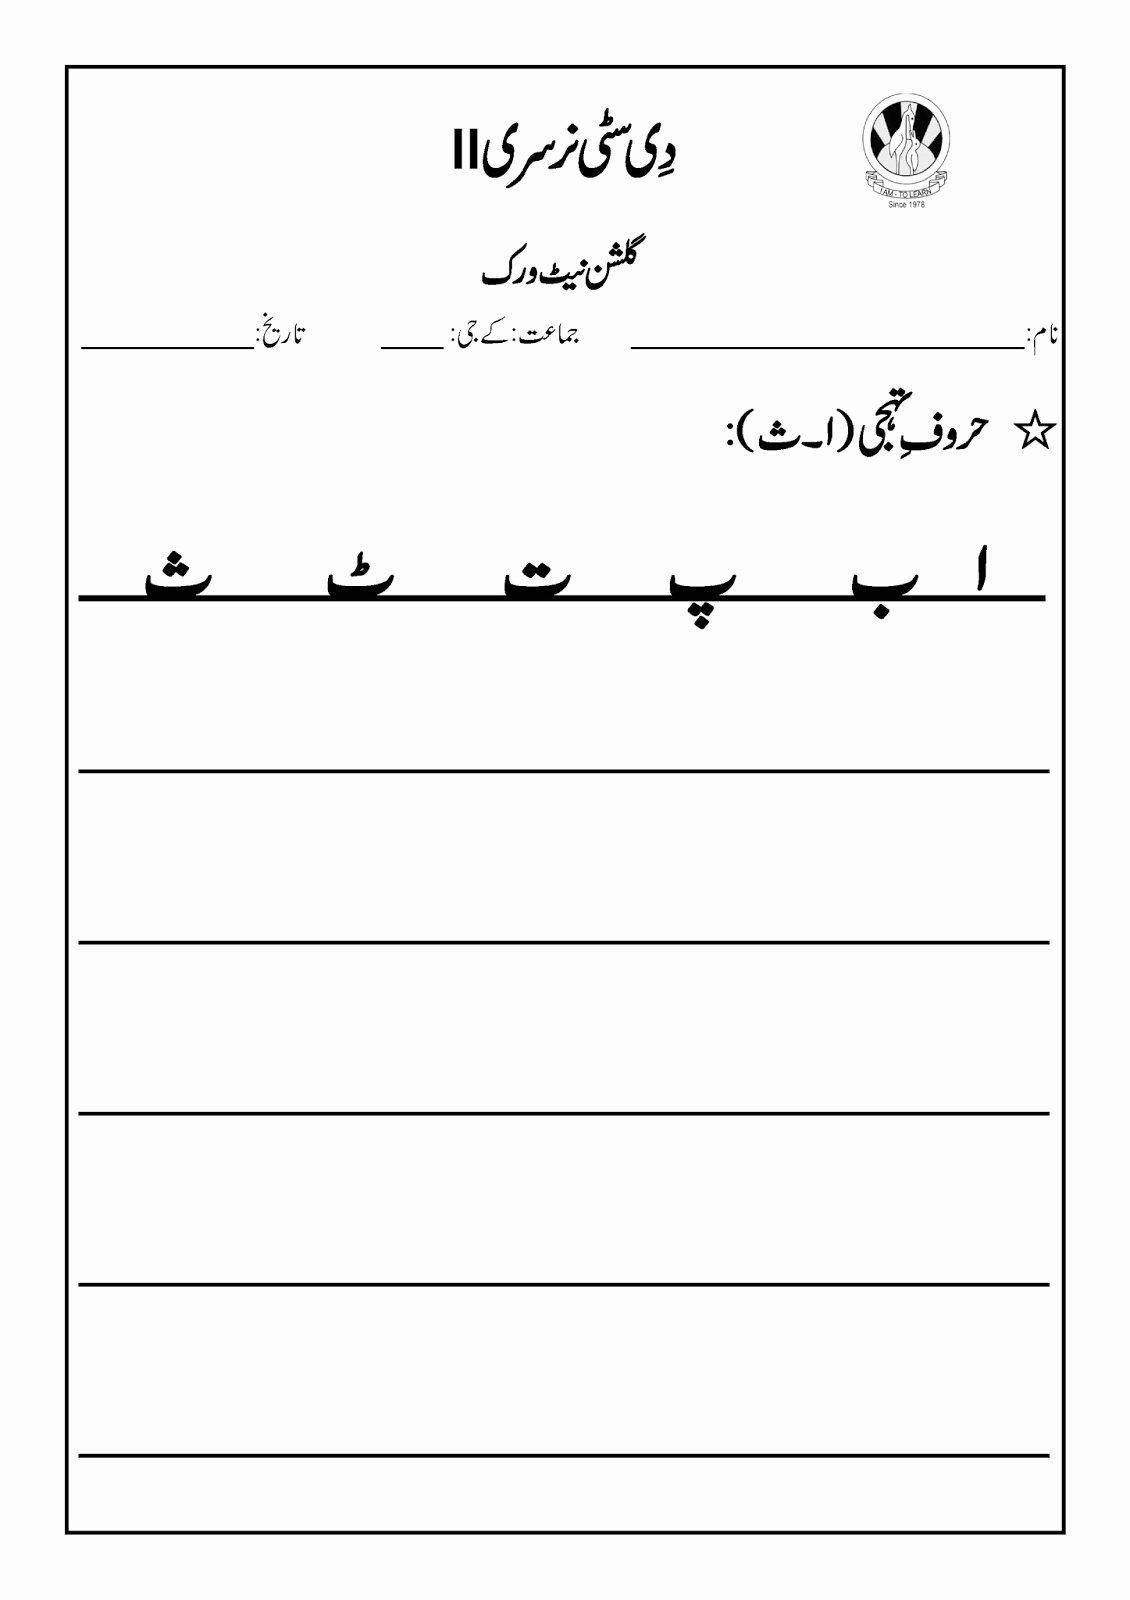 Download Urdu Worksheets for Preschoolers Inspirational Worksheet Printable Worksheets and Activities for Teachers